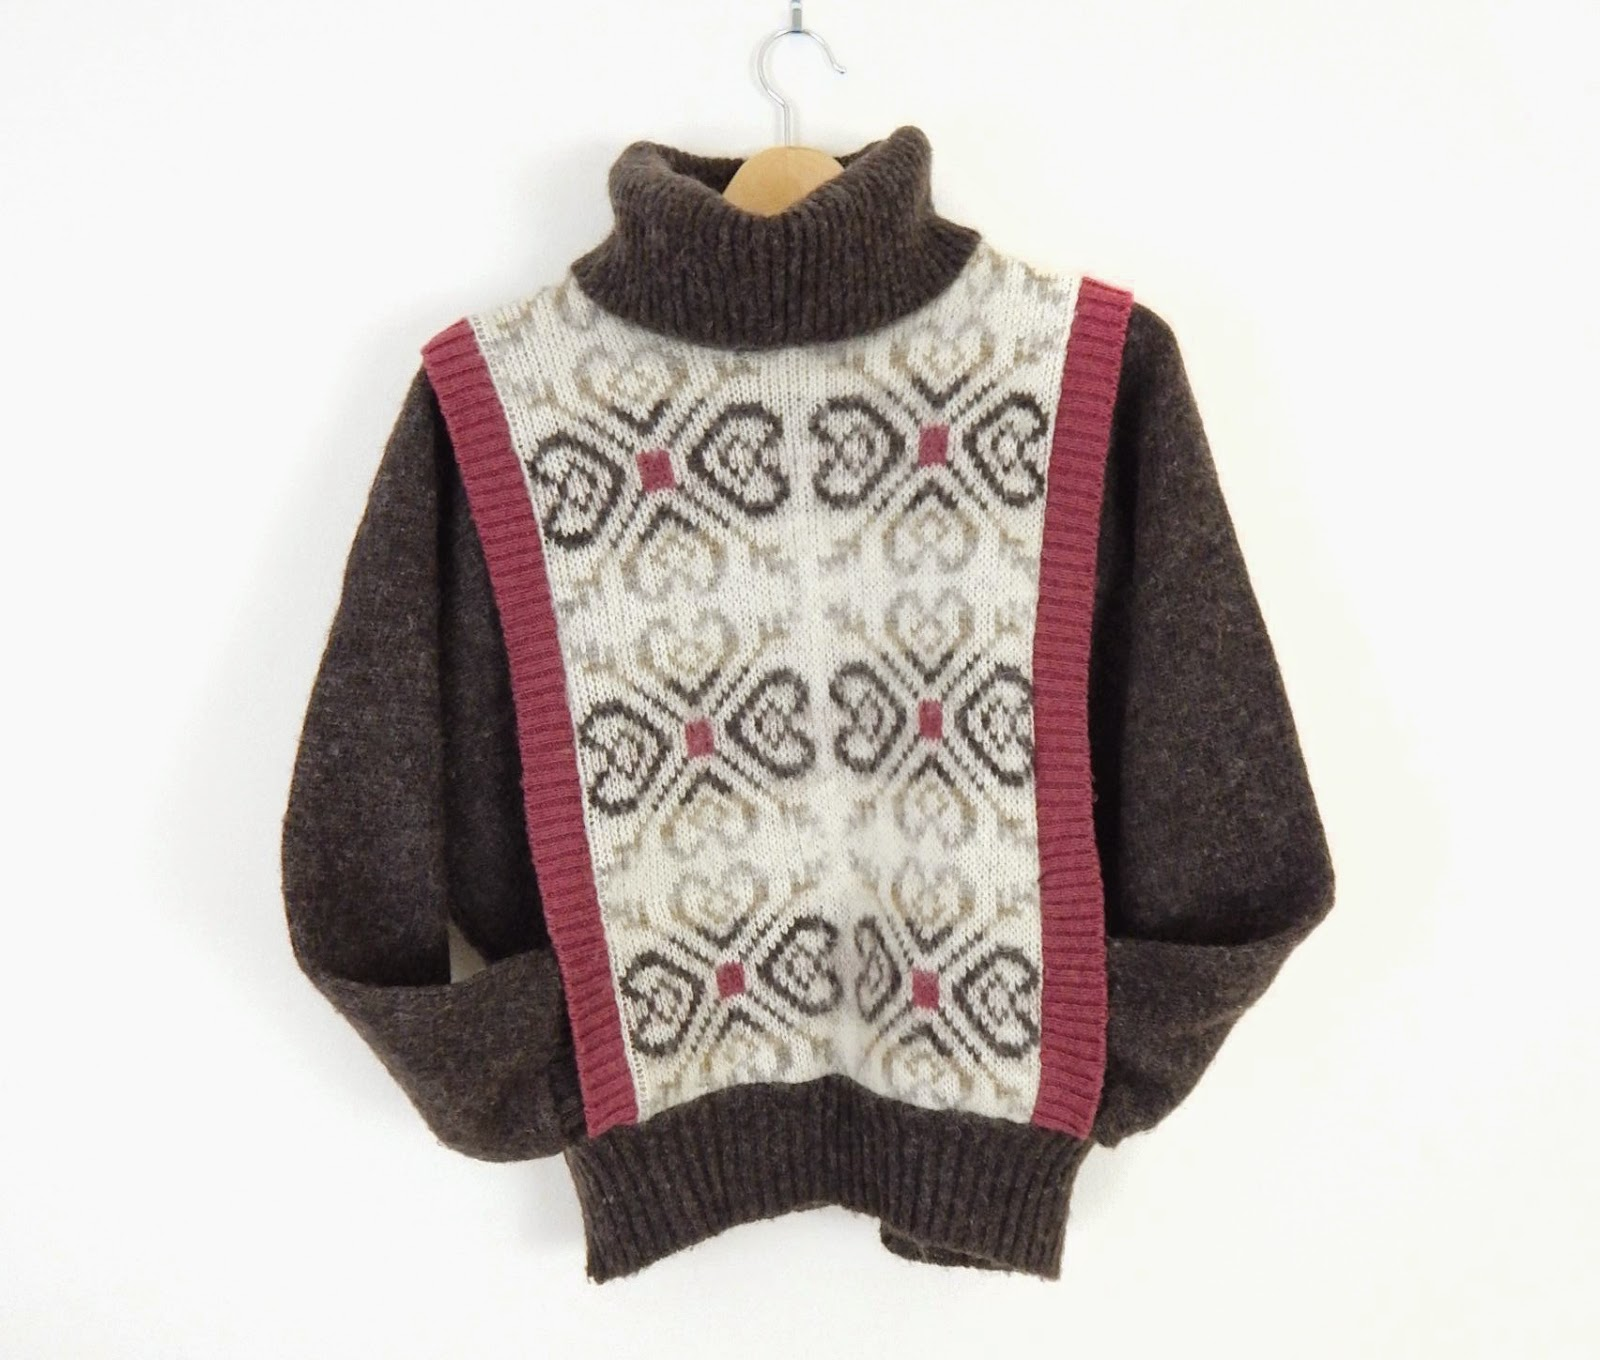 https://www.etsy.com/listing/210038118/vintage-80s-icelandic-wool-womens?